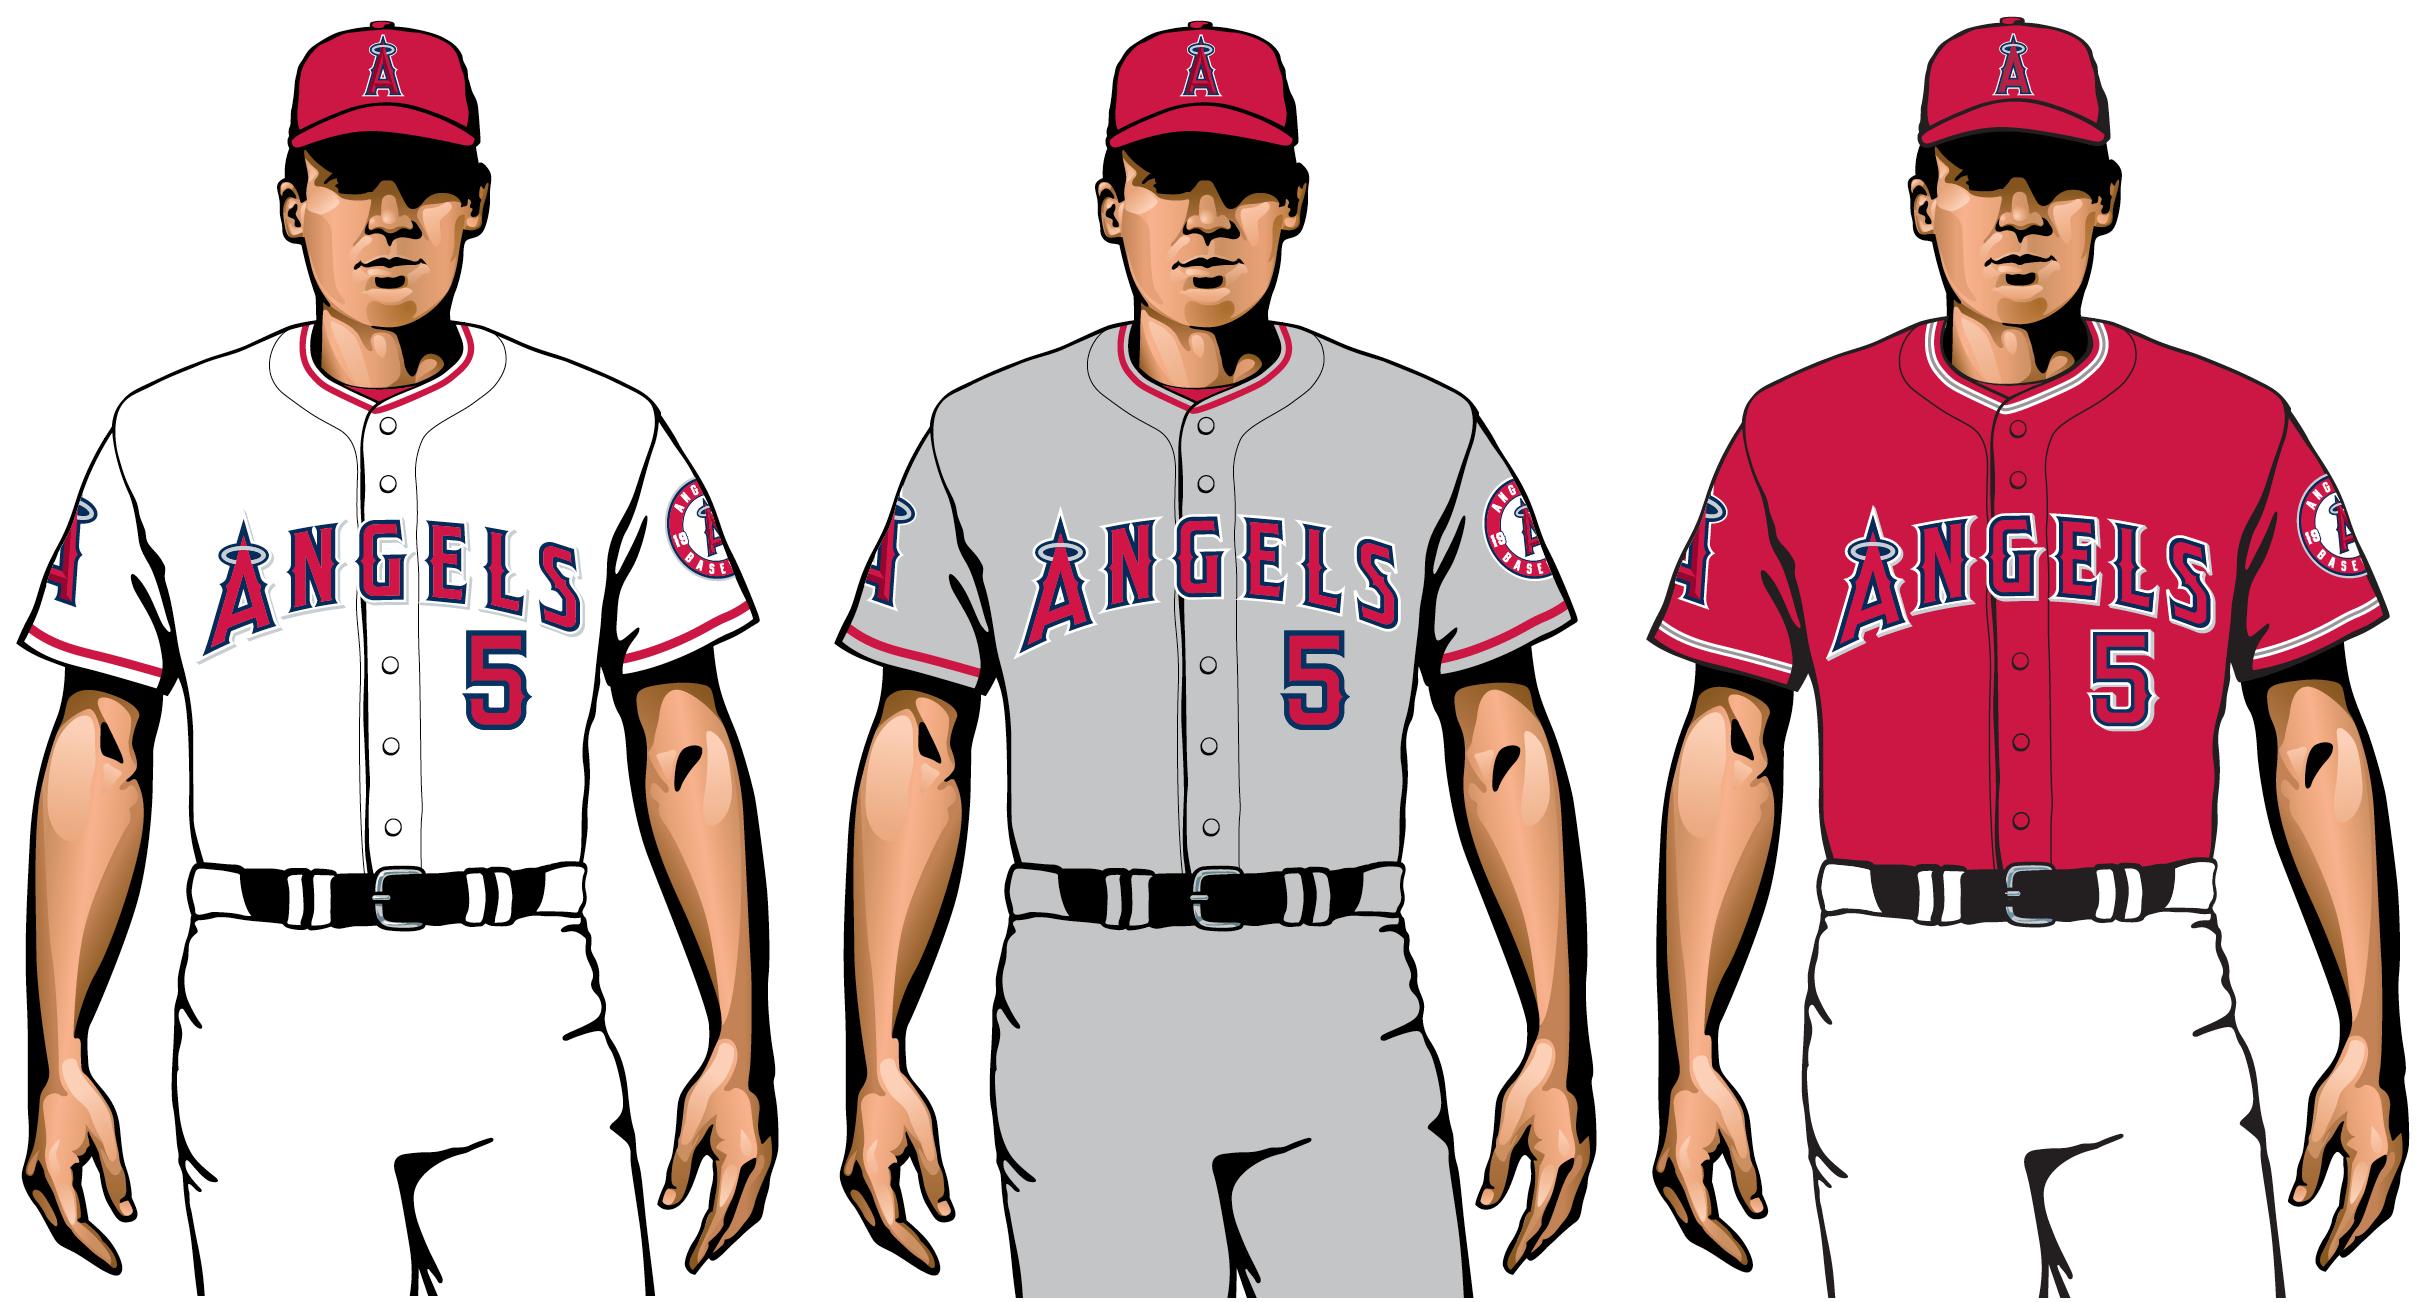 ángeles 2020 uniformes